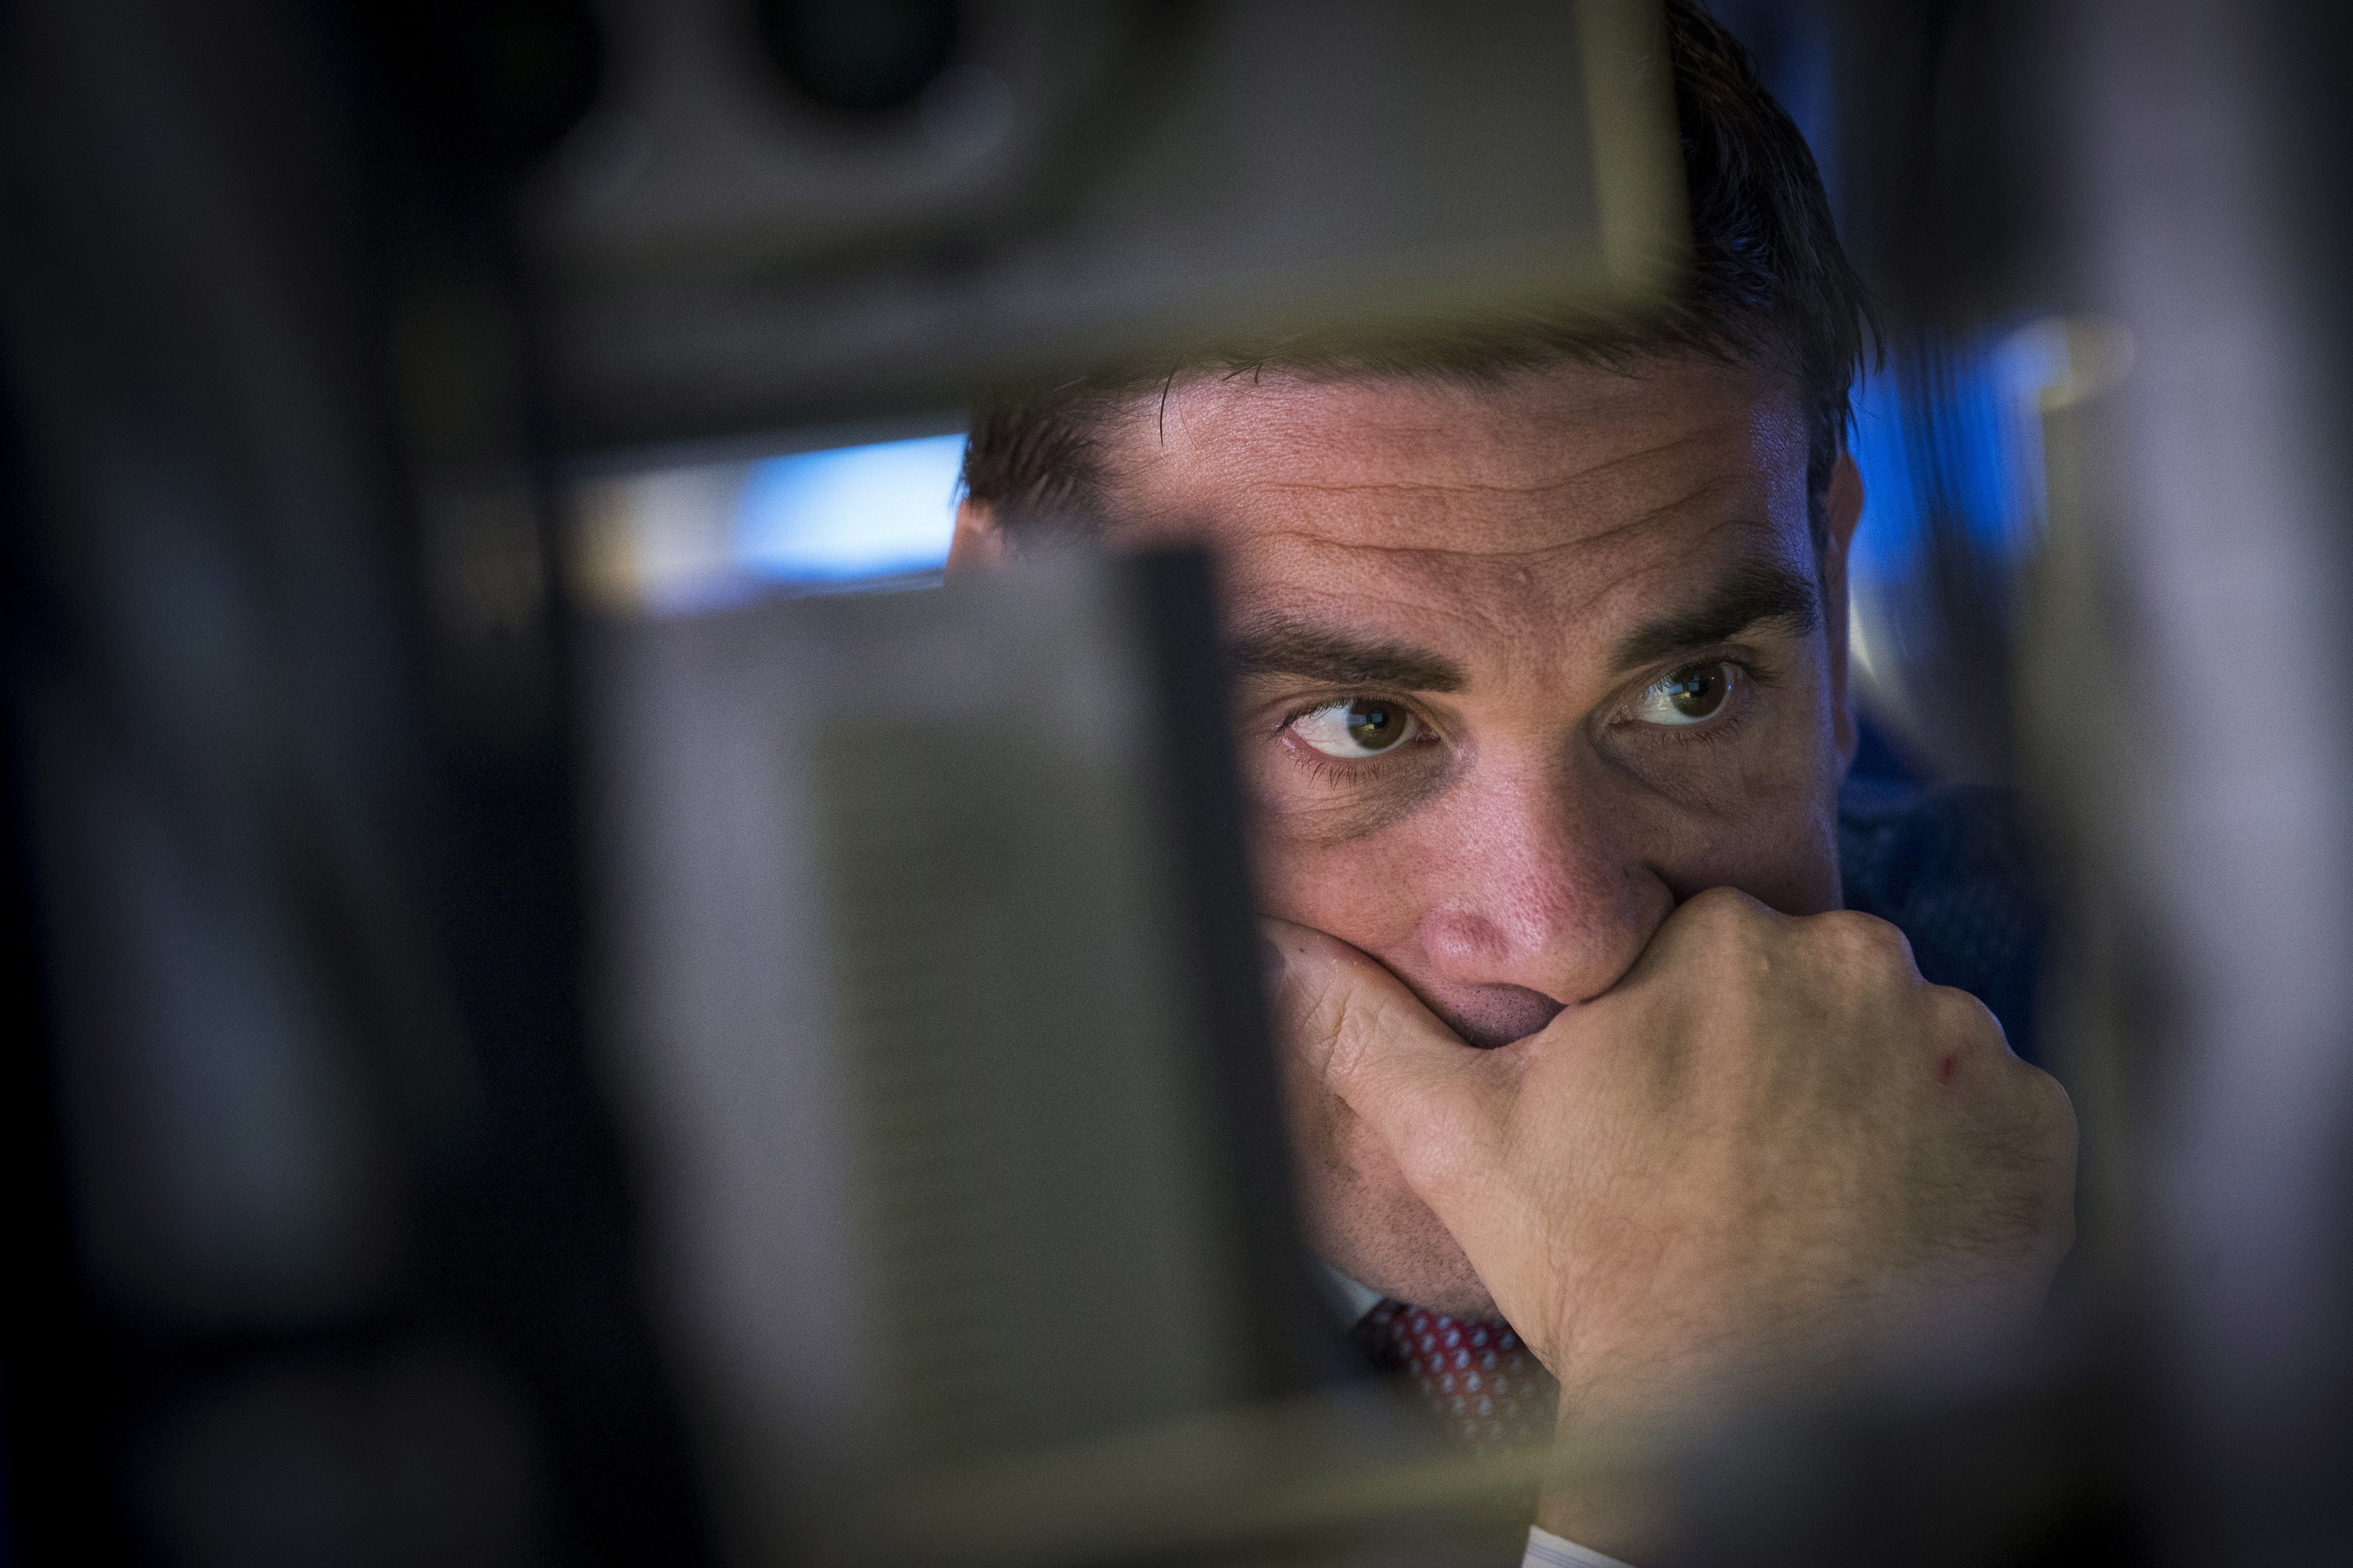 «H υπομονή της Ελλάδας αποδίδει», αναφέρουν οι ανάδοχοι της έκδοσης του 7ετούς